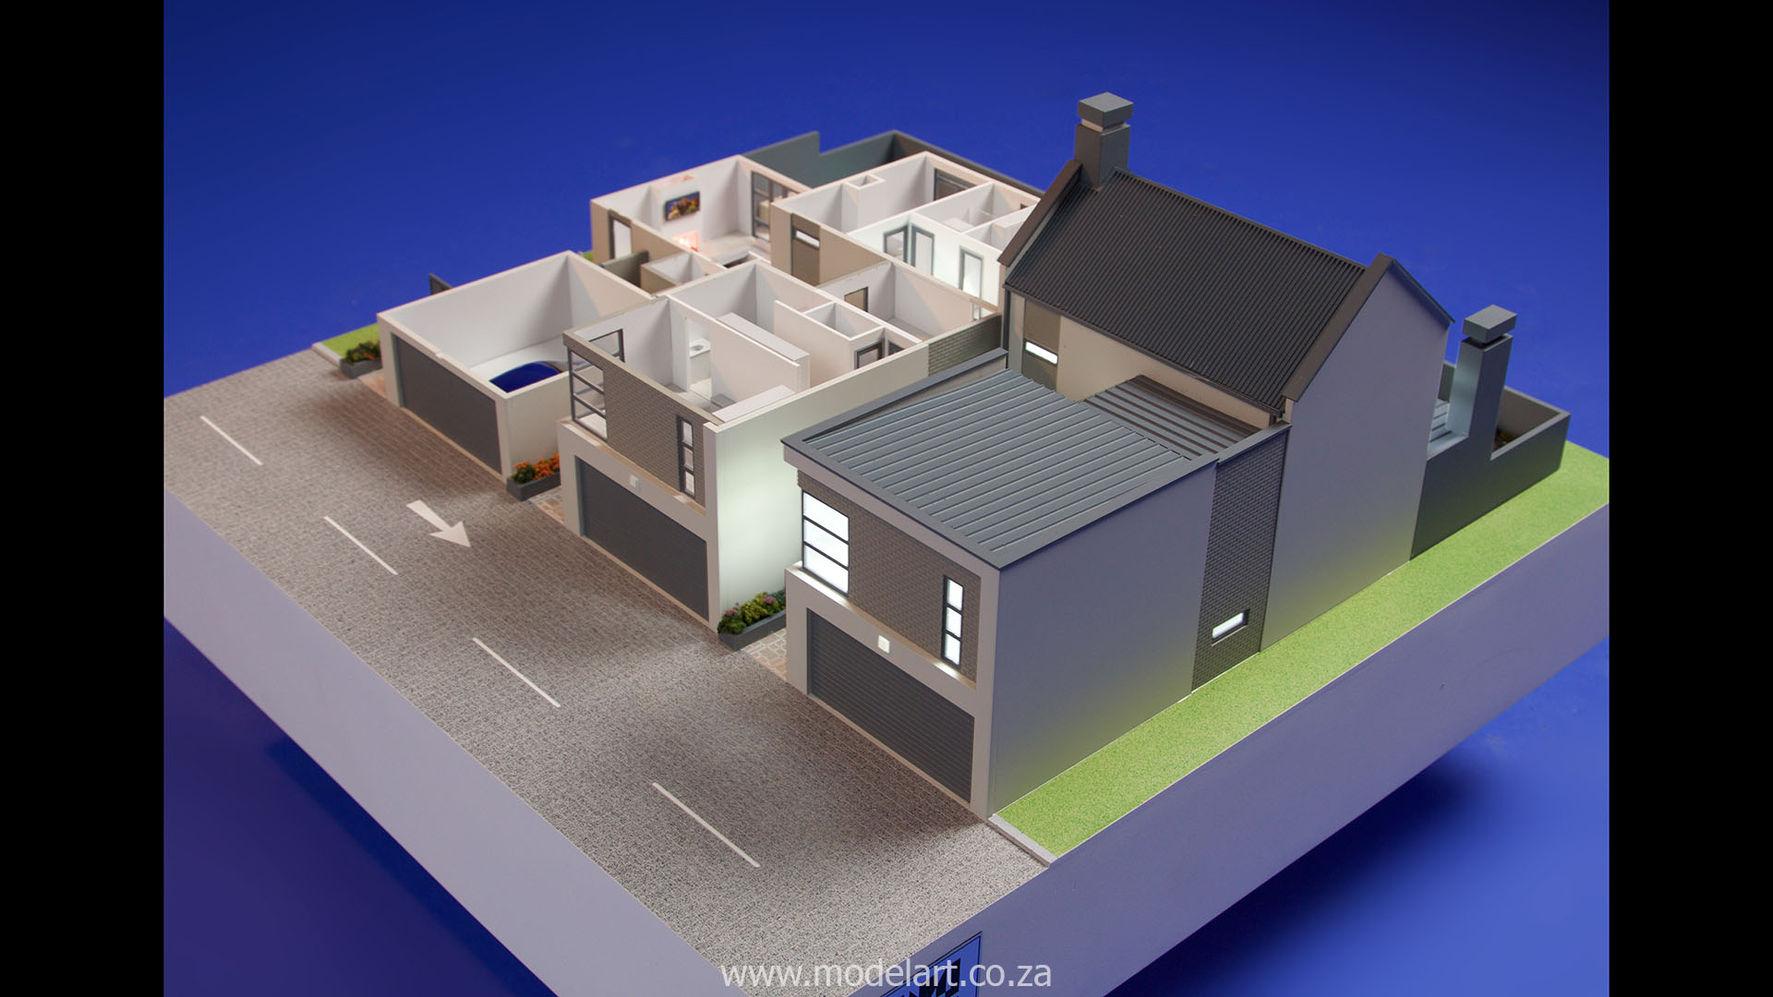 Modelart-Architectural-Scale-Model-Inter